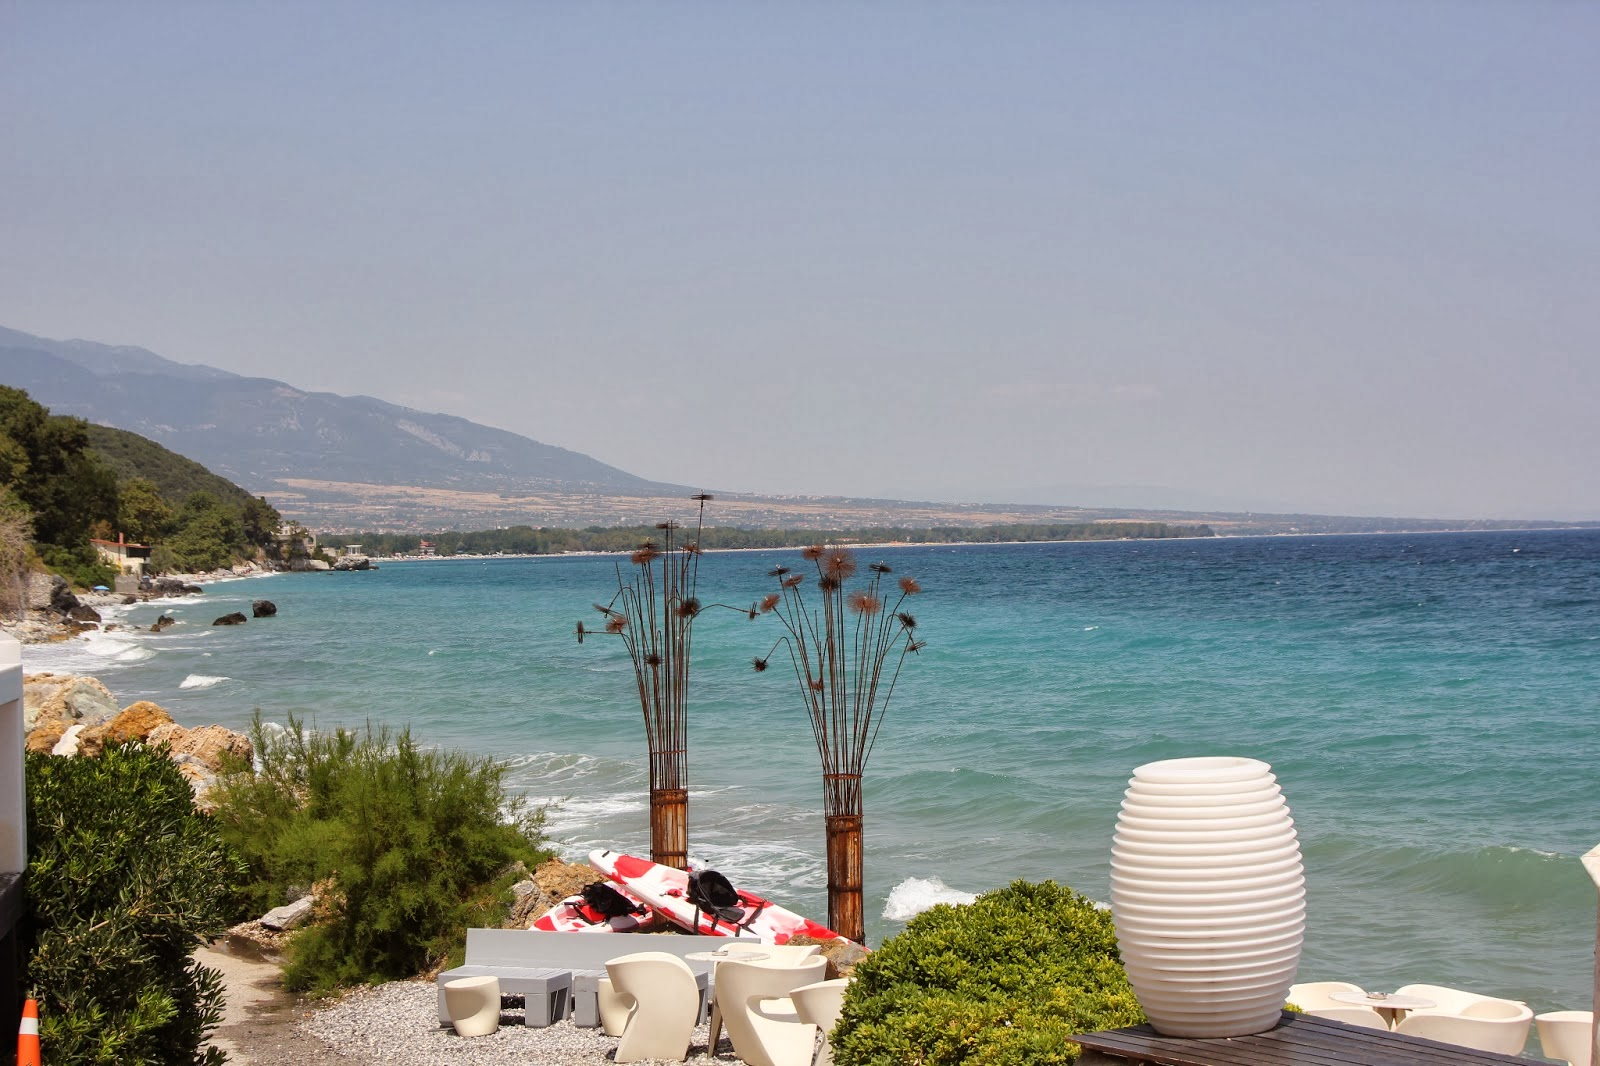 Grecja: Nei Pori, Platamon